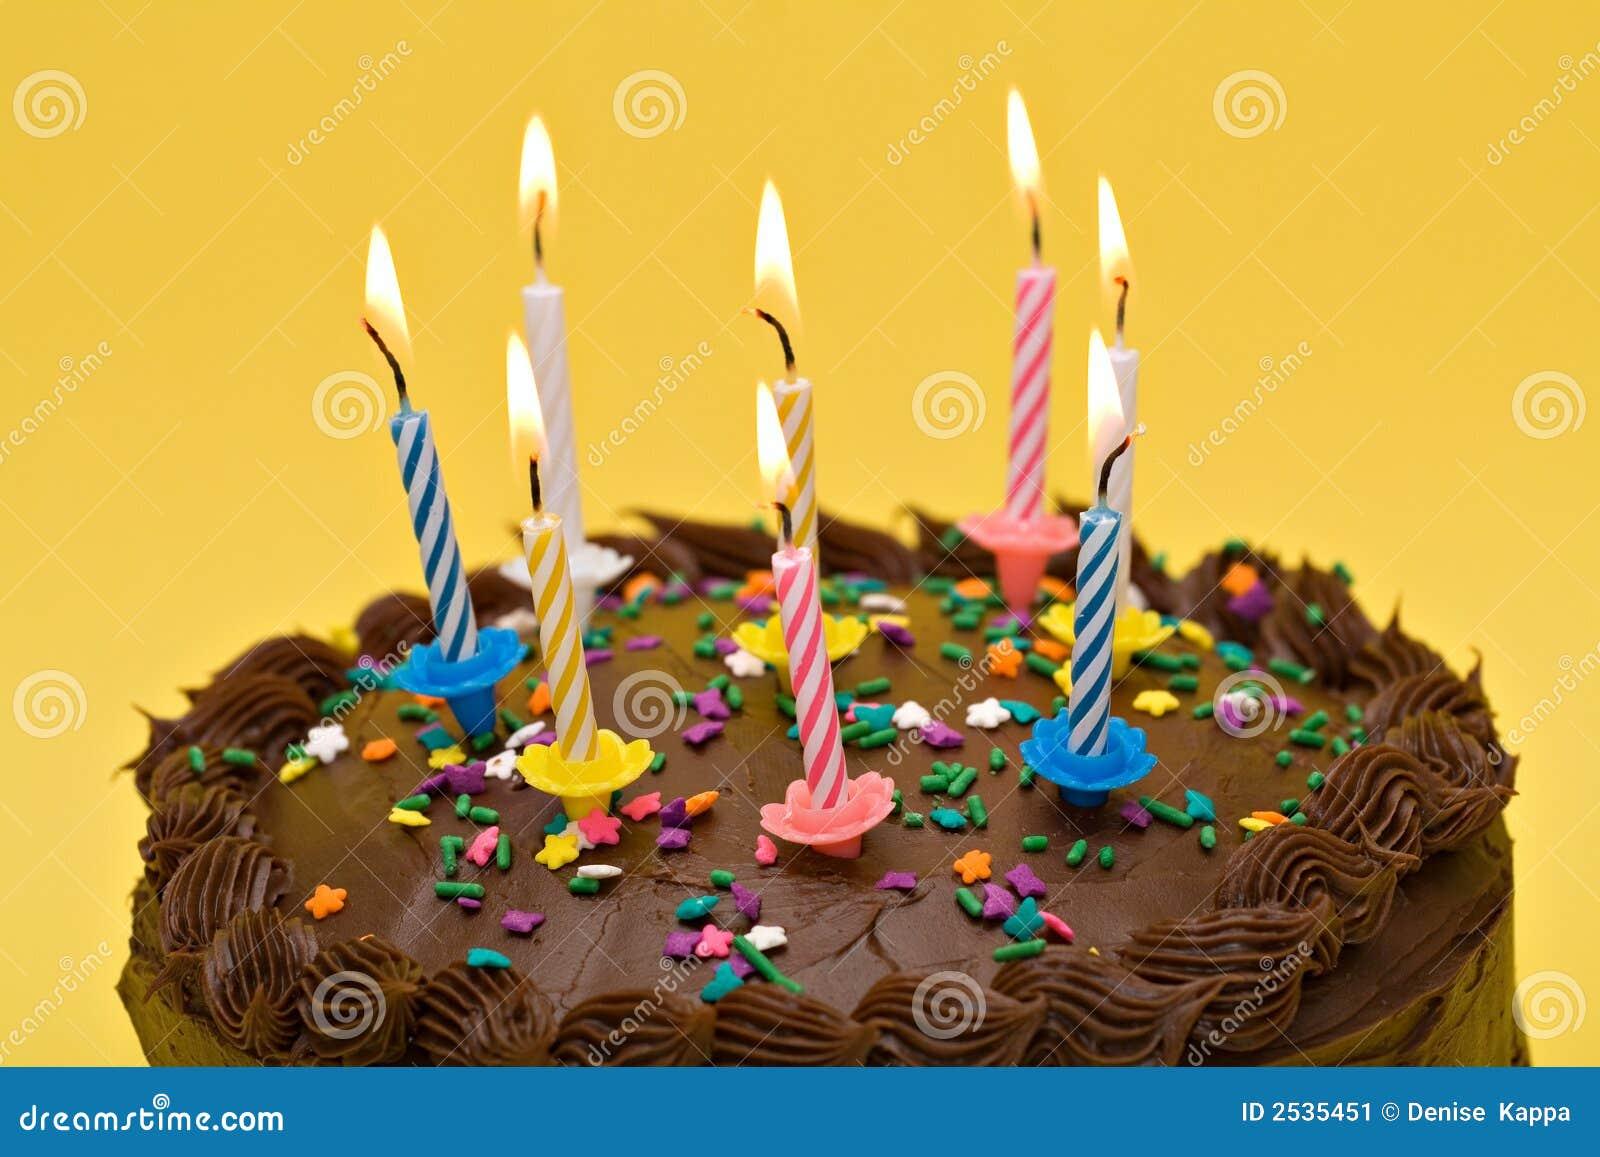 Birthday Cake Stock Image Image Of Birthday Confetti